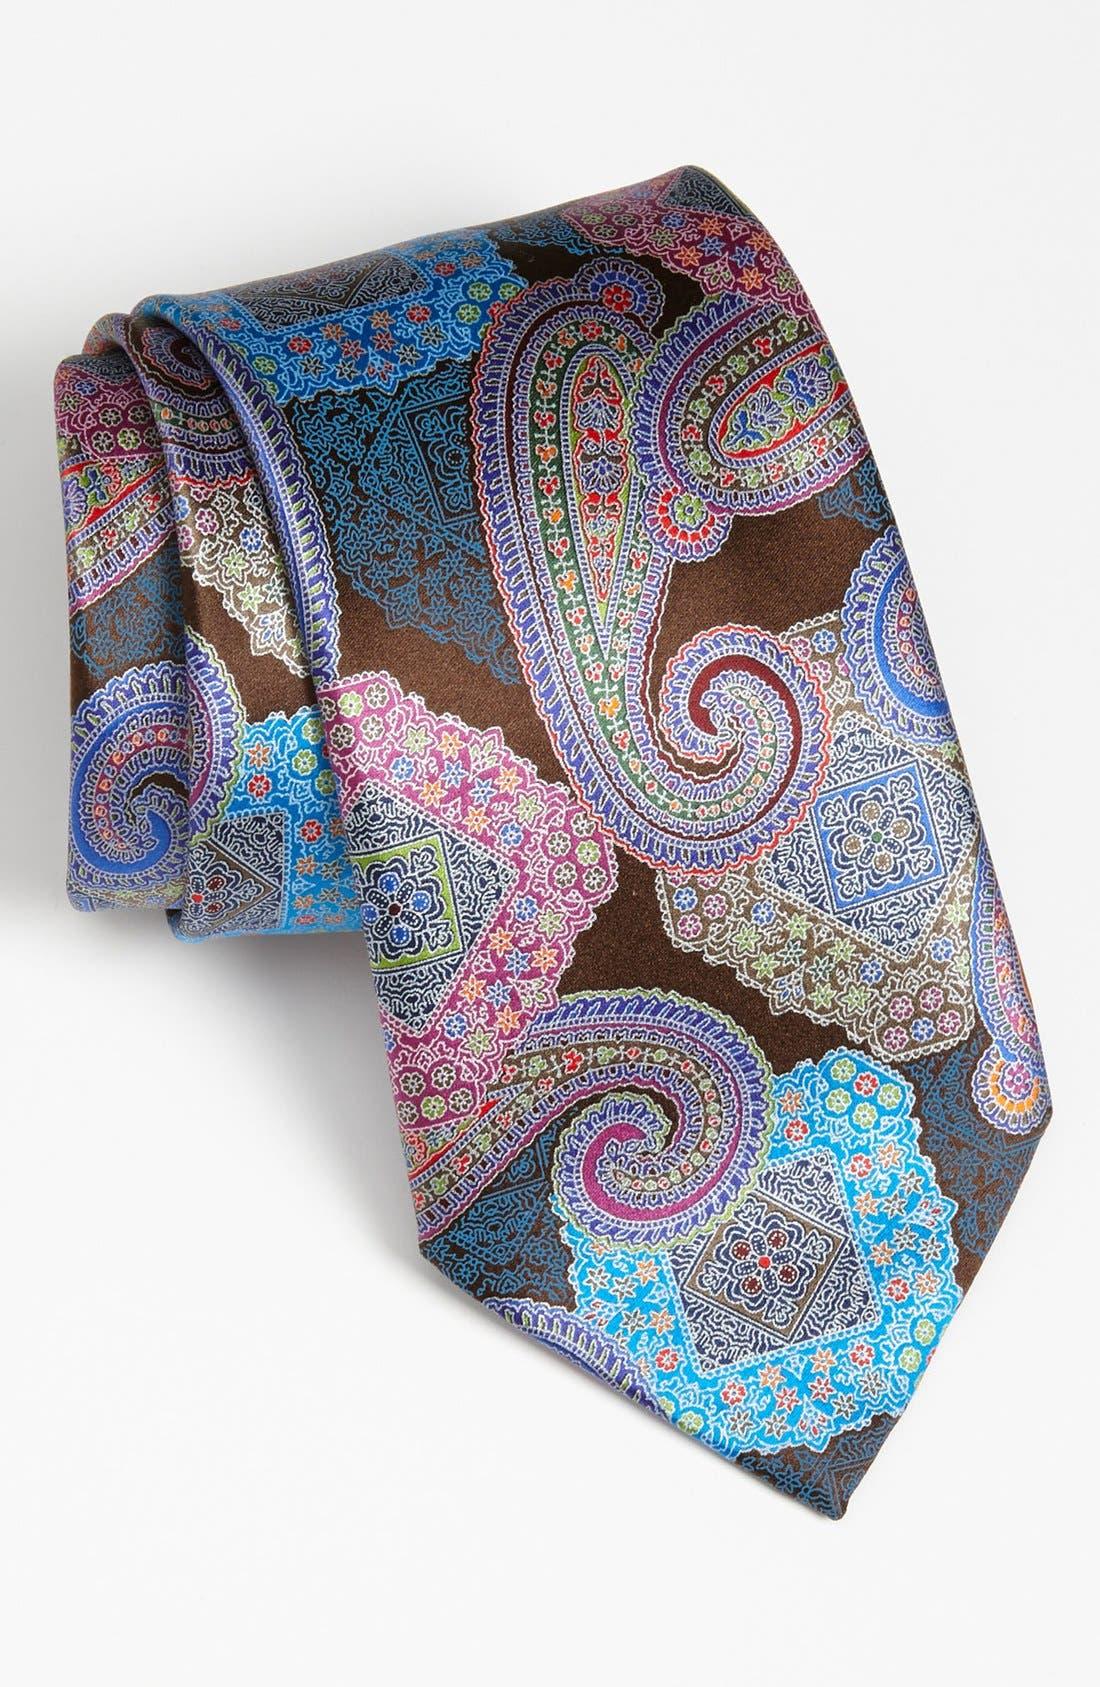 Alternate Image 1 Selected - Ermenegildo Zegna 'Quindici' Woven Silk Tie